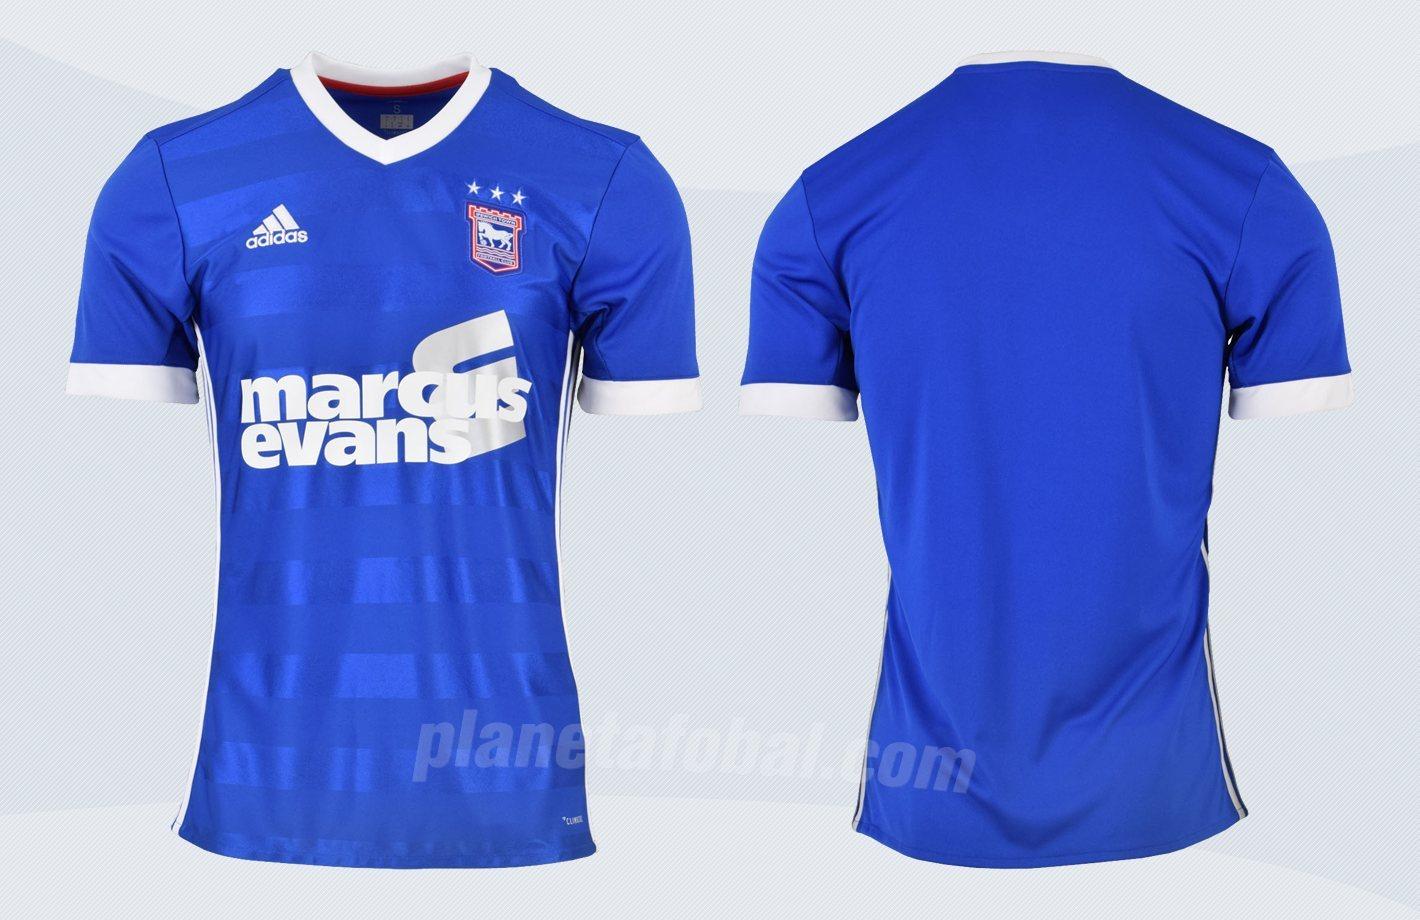 Camiseta titular del Ipswich Town FC | Imágenes Web Oficial